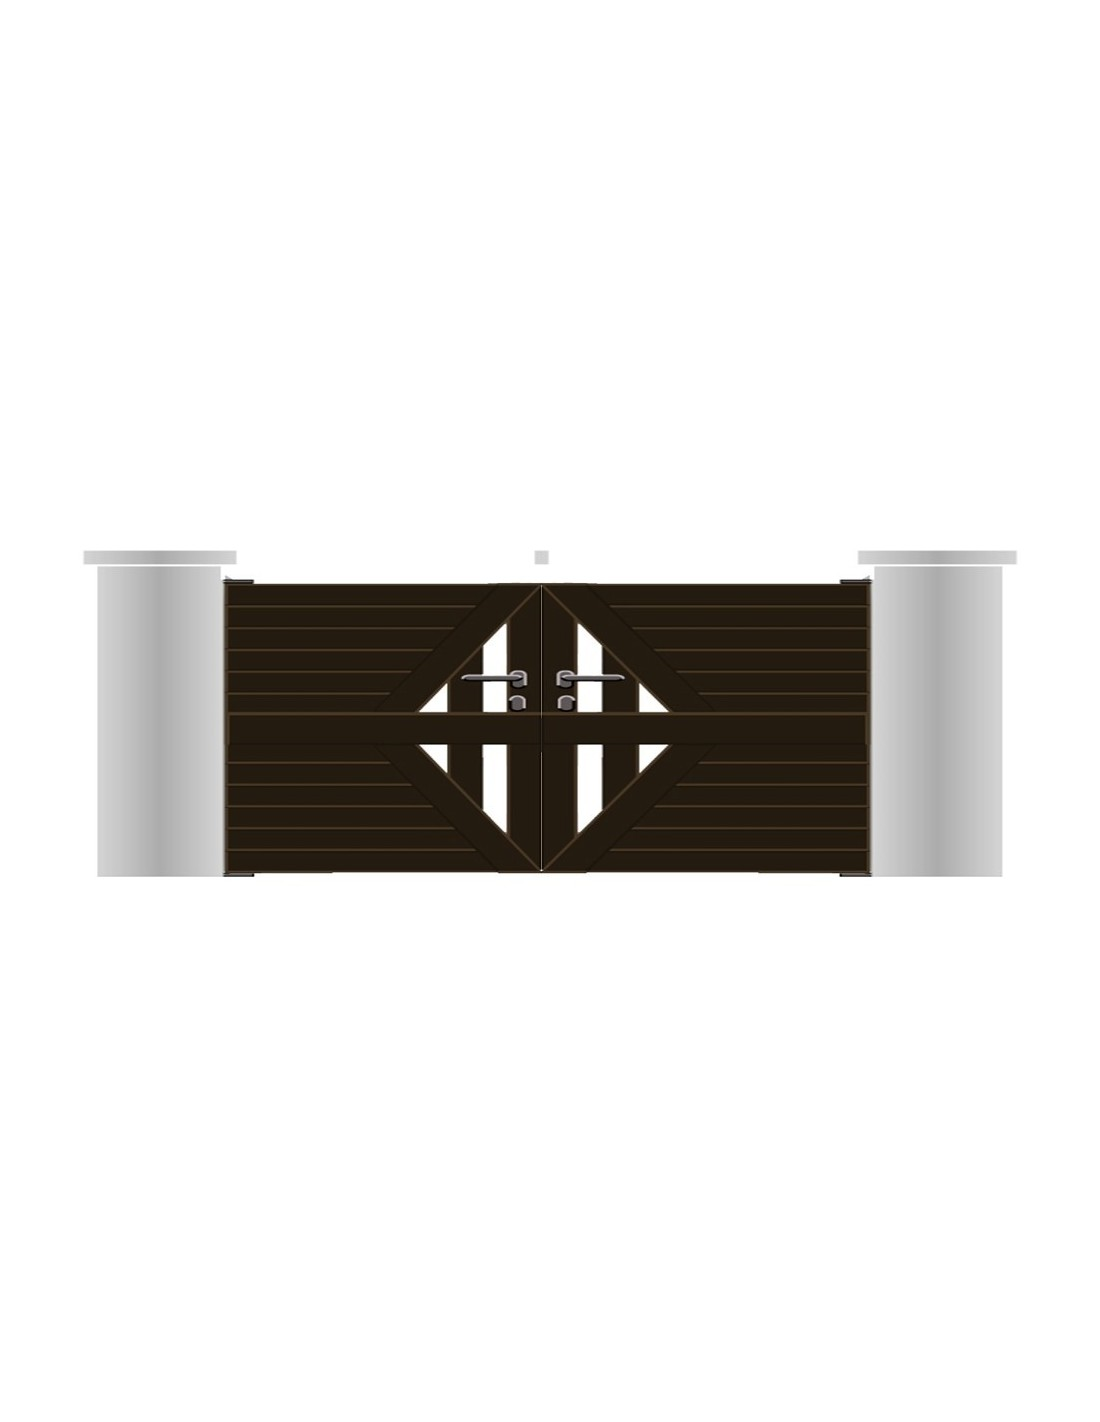 portail aluminium vannes design contemporain sur mesure sur mesure 3m50 4m 4m50 5m. Black Bedroom Furniture Sets. Home Design Ideas